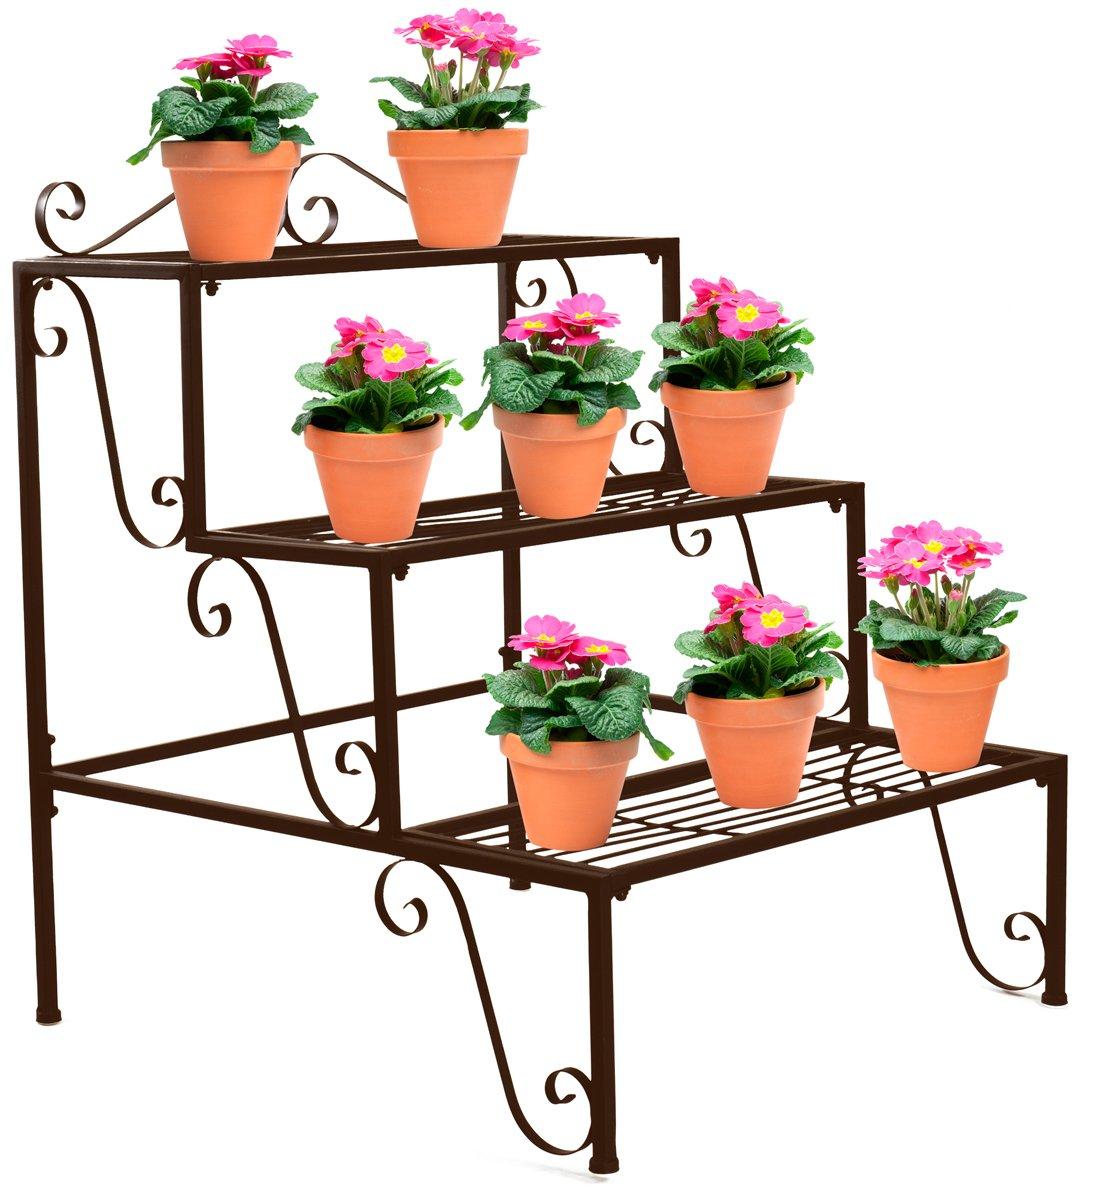 Sorbus 3-Tier Flower Plant Stand - Rectangular Shelf Step Design – Ideal Flower Pot Holder for Home, Garden, Patio, Plant Lovers, Housewarming, Mother's Day (3 Step (Bronze))